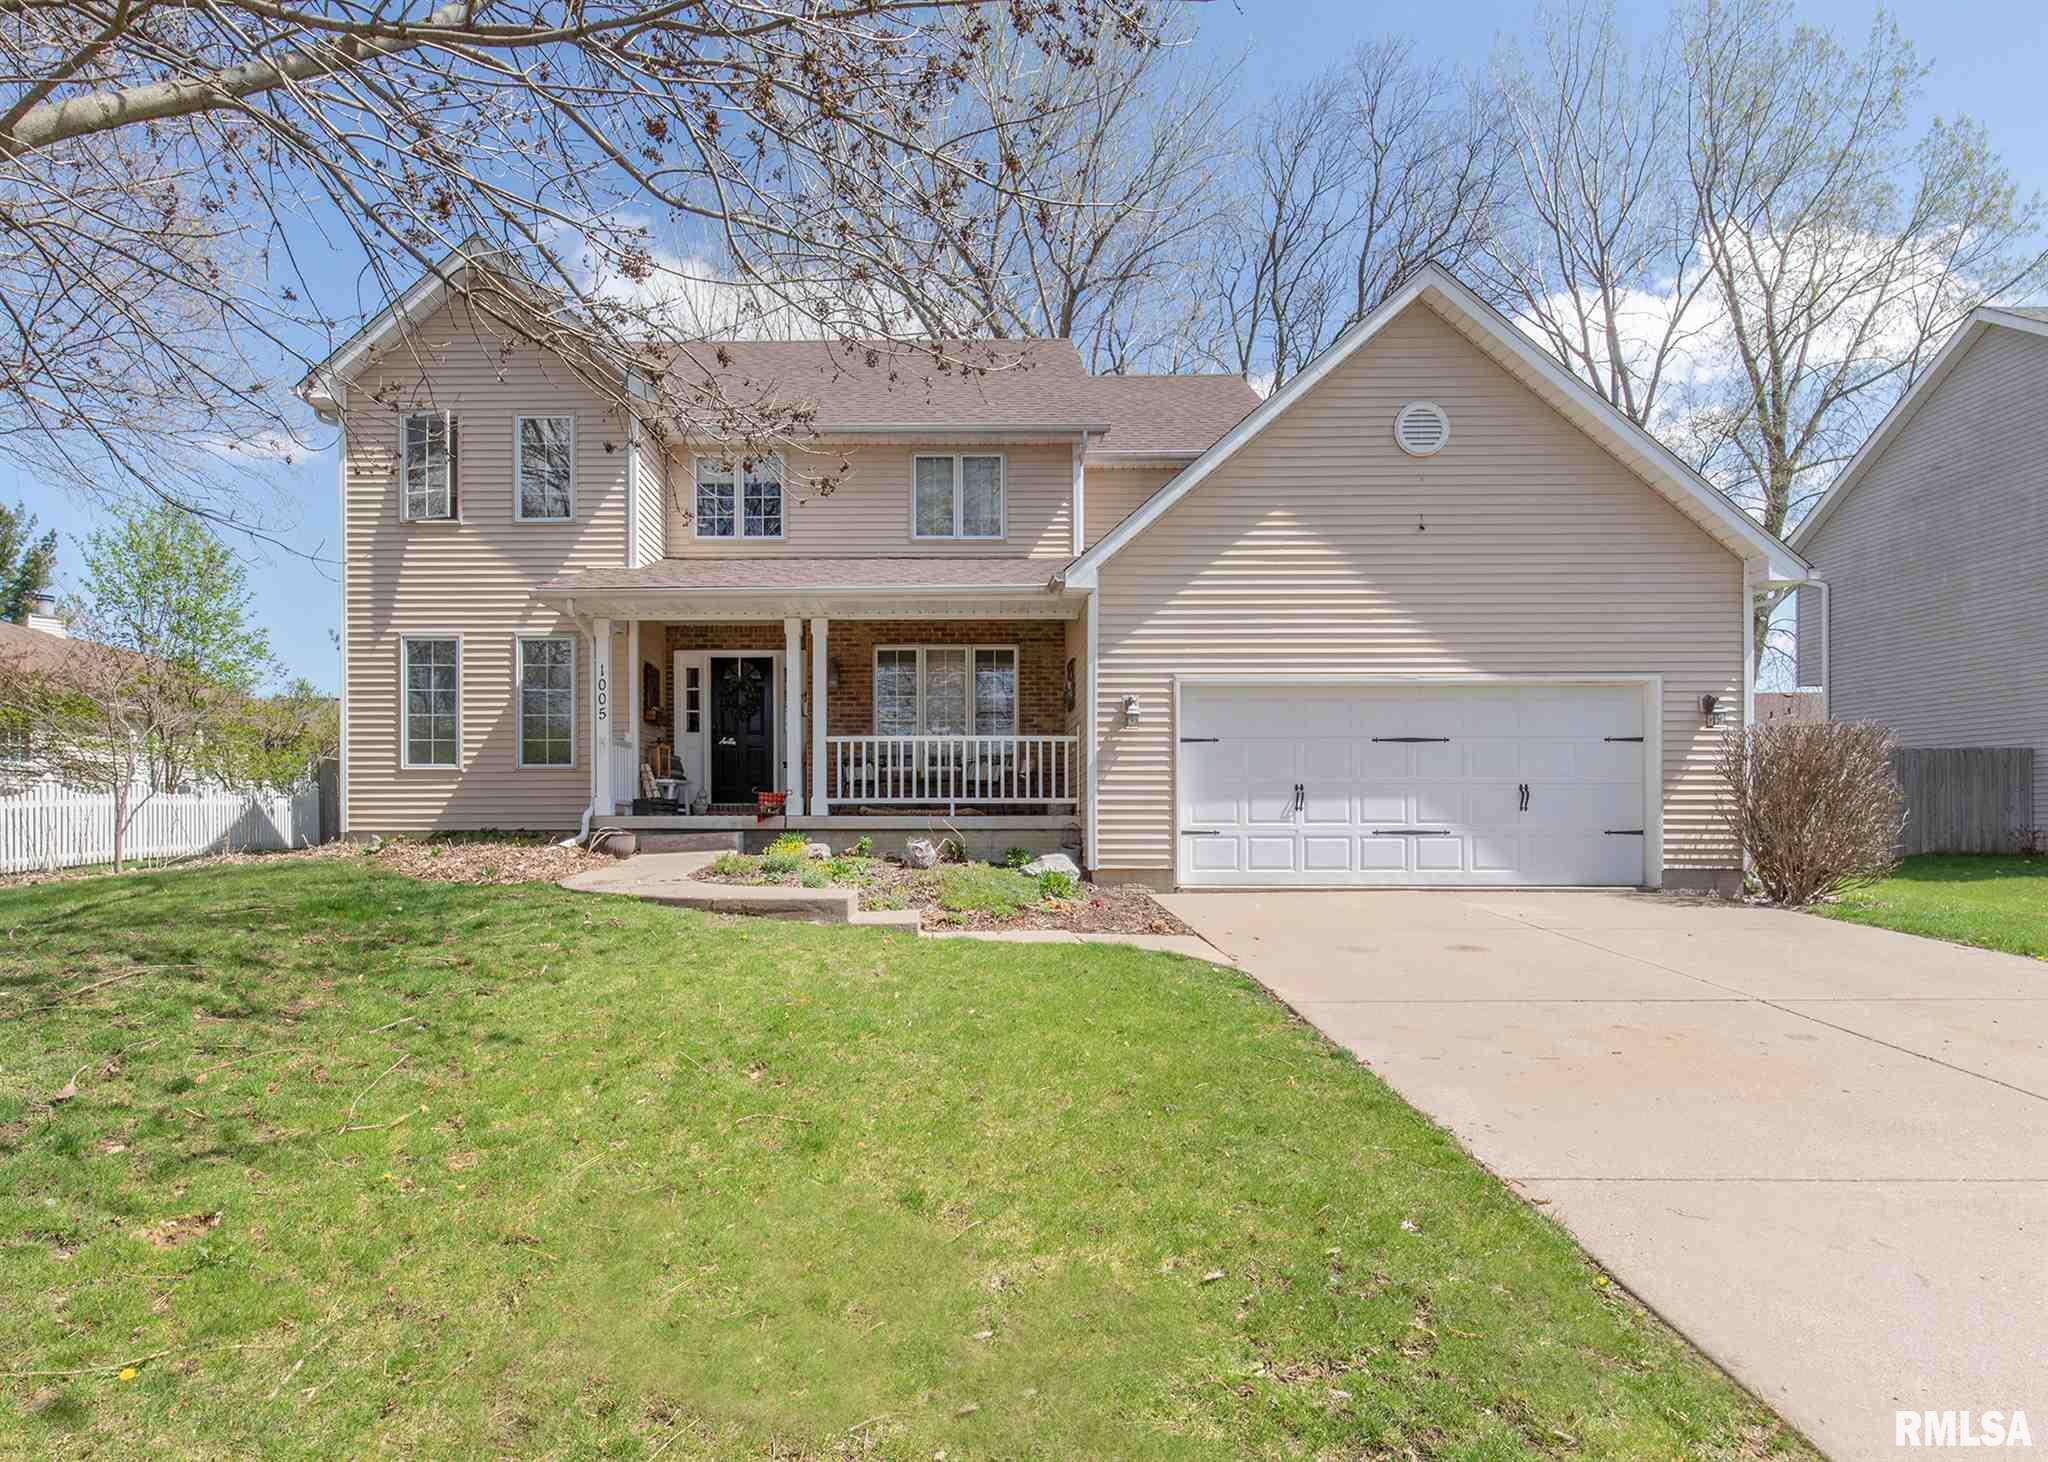 1005 E 5TH Property Photo - Coal Valley, IL real estate listing